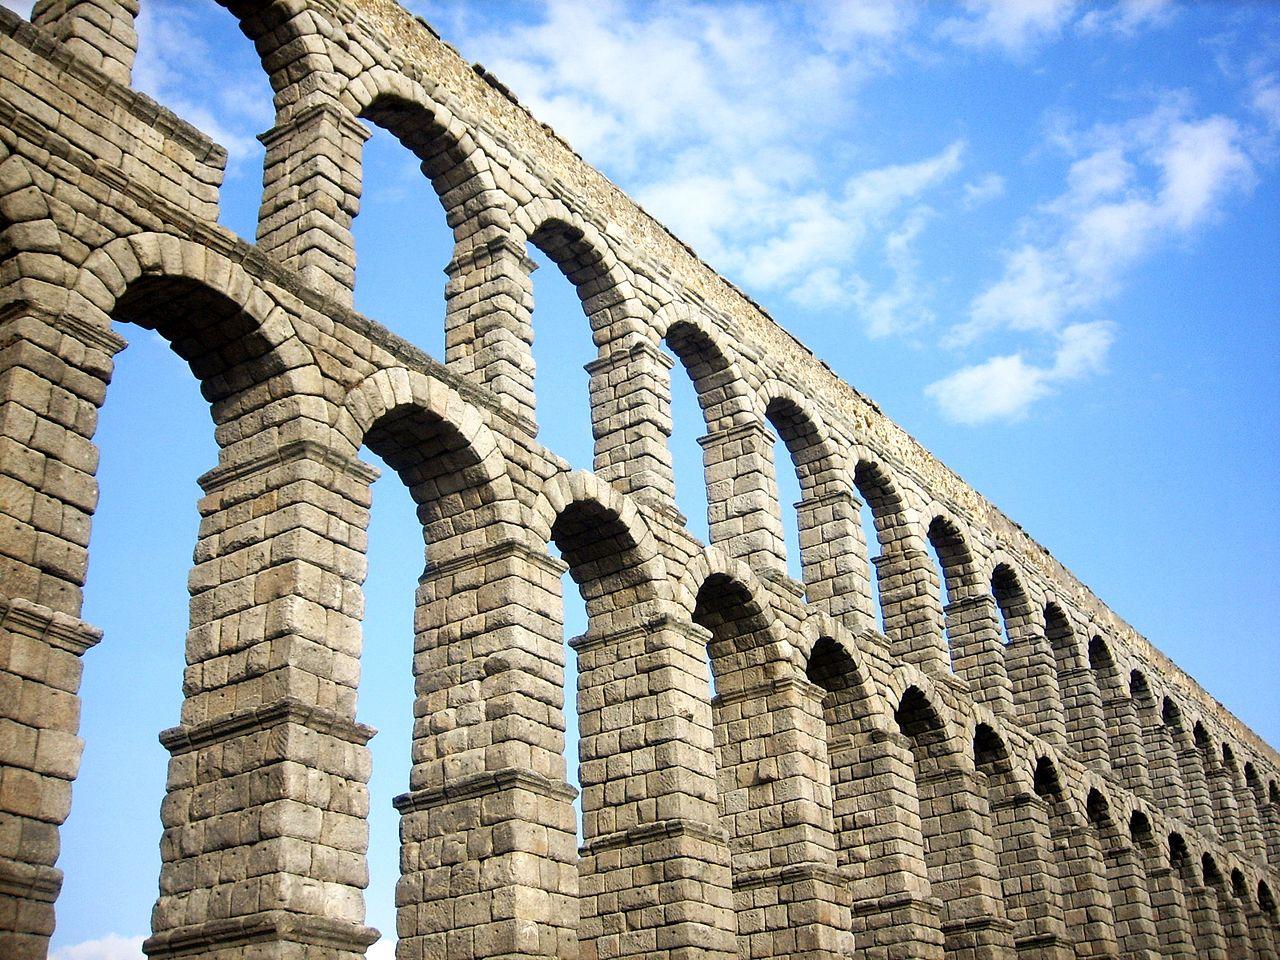 File:Acueducto en Segovia.jpg - Wikimedia Commons